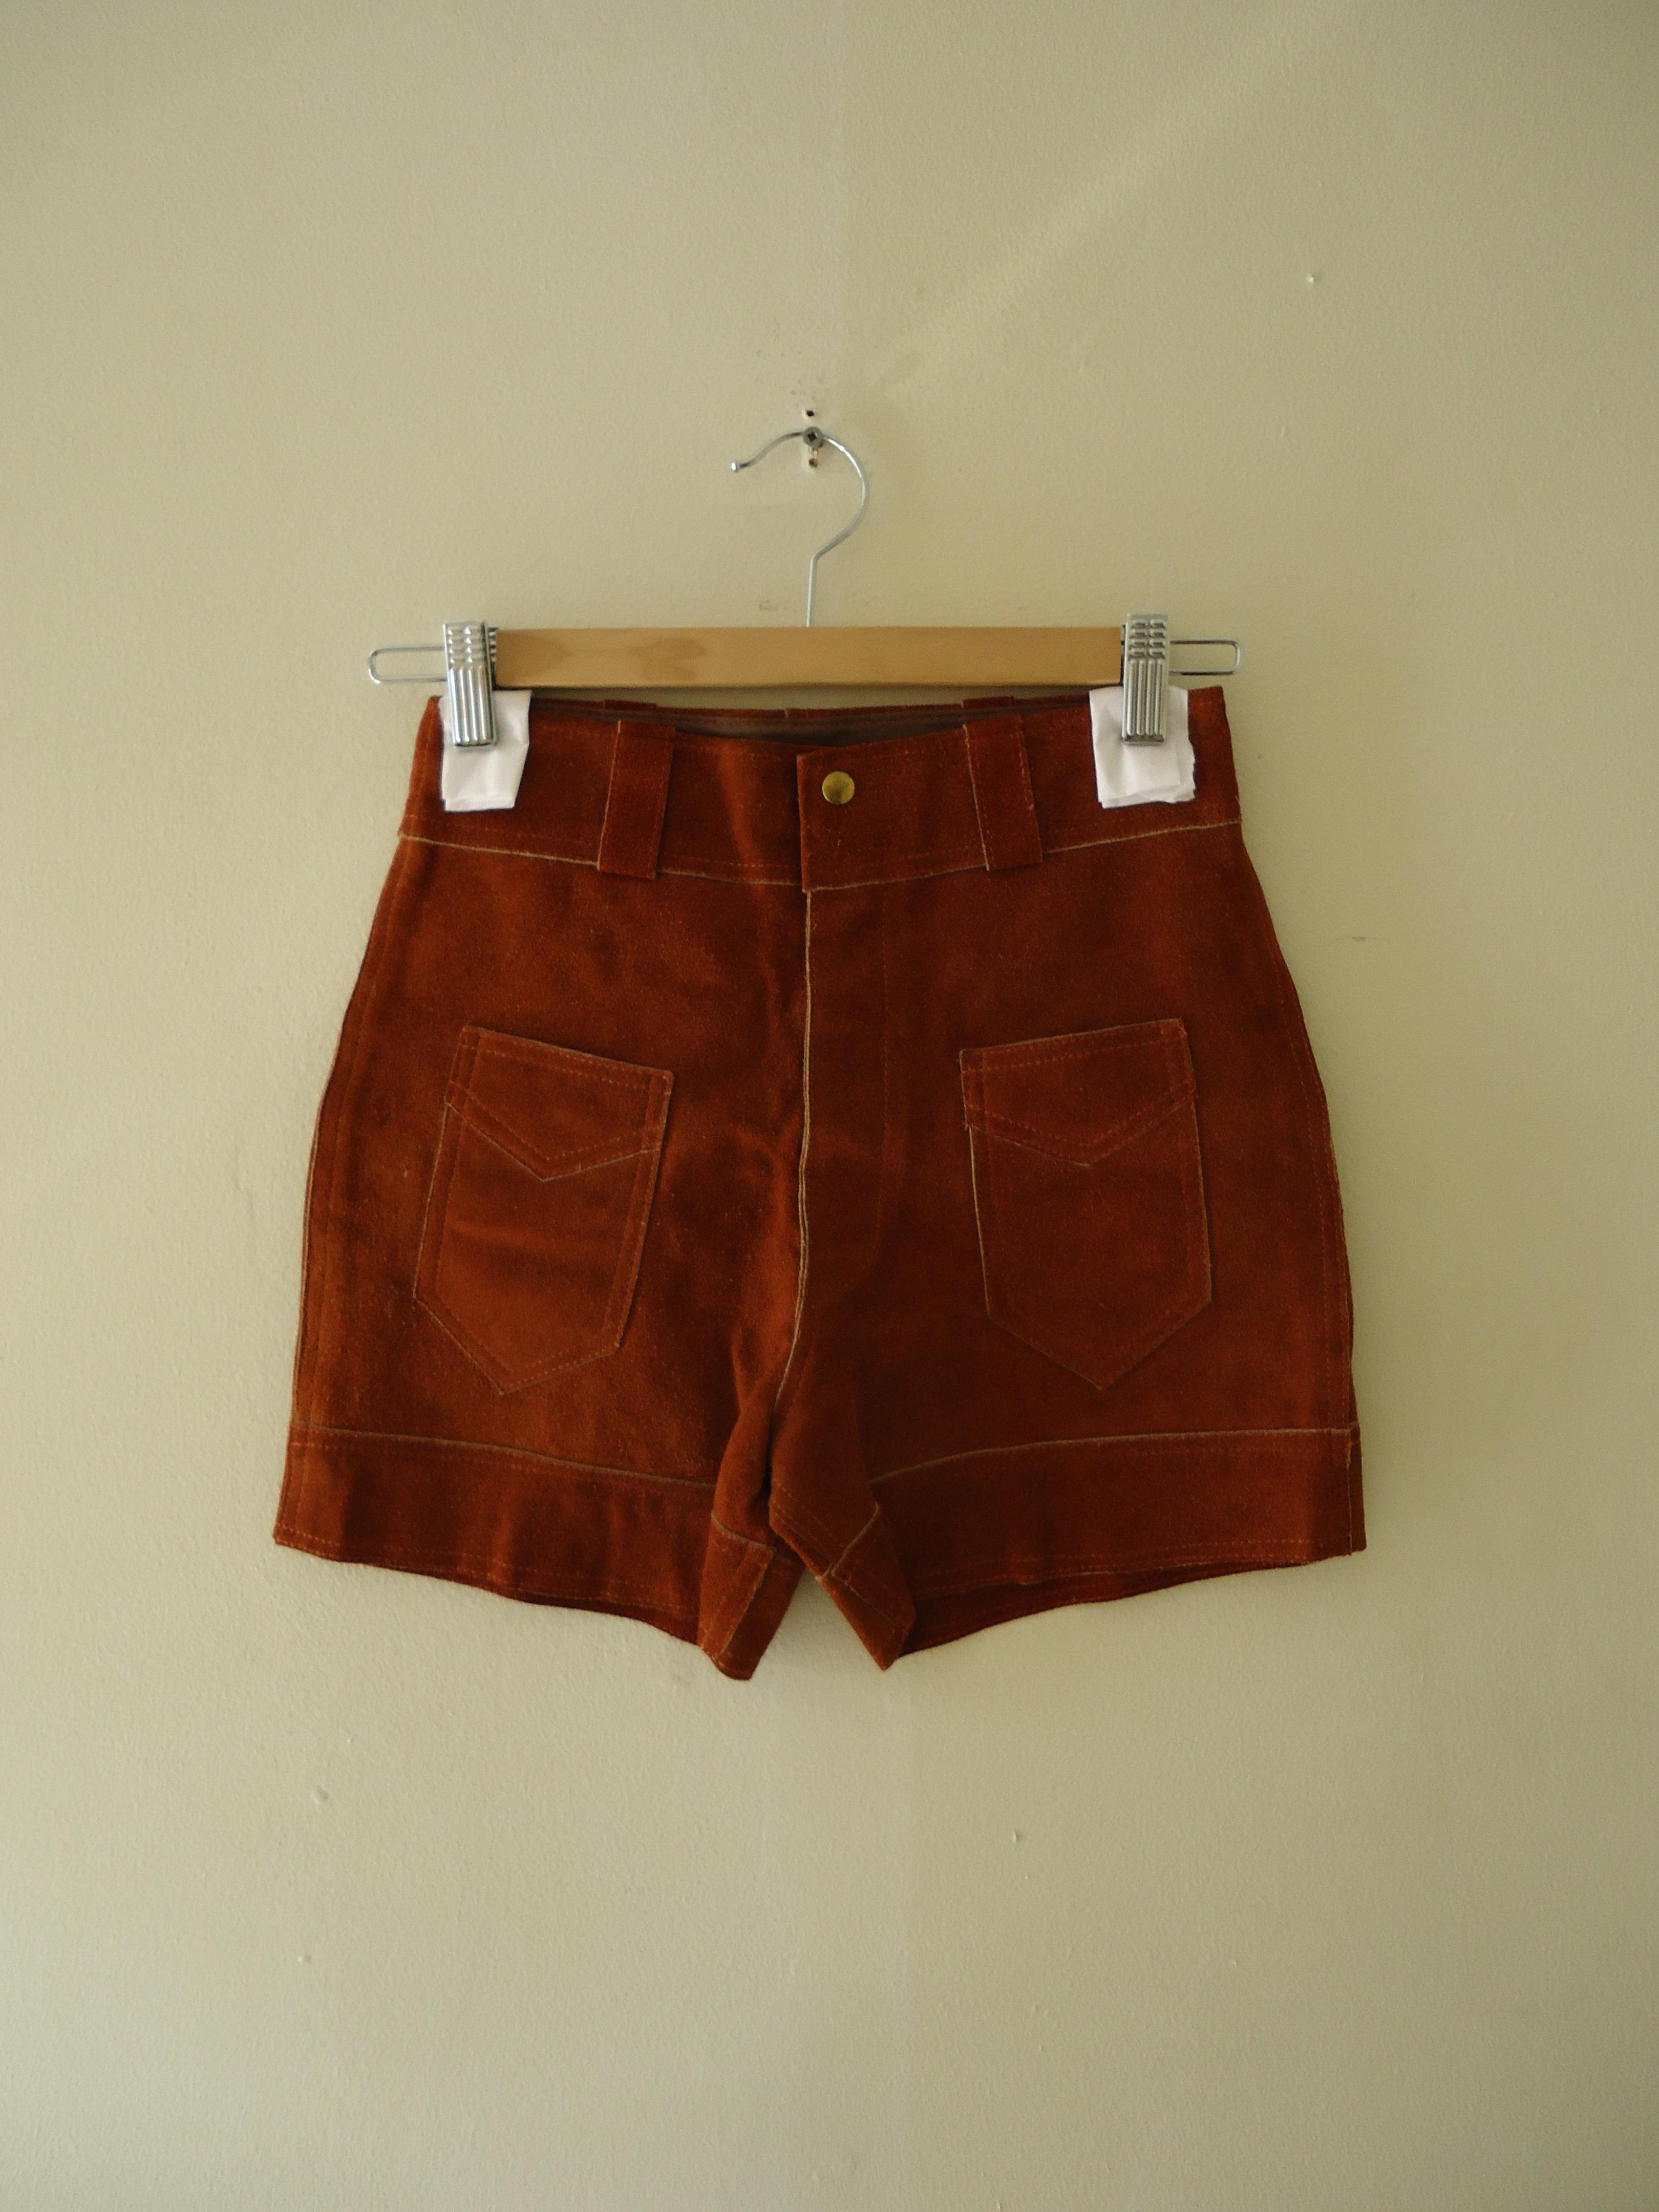 Irene & Irene Vintage Suede Hot Shorts